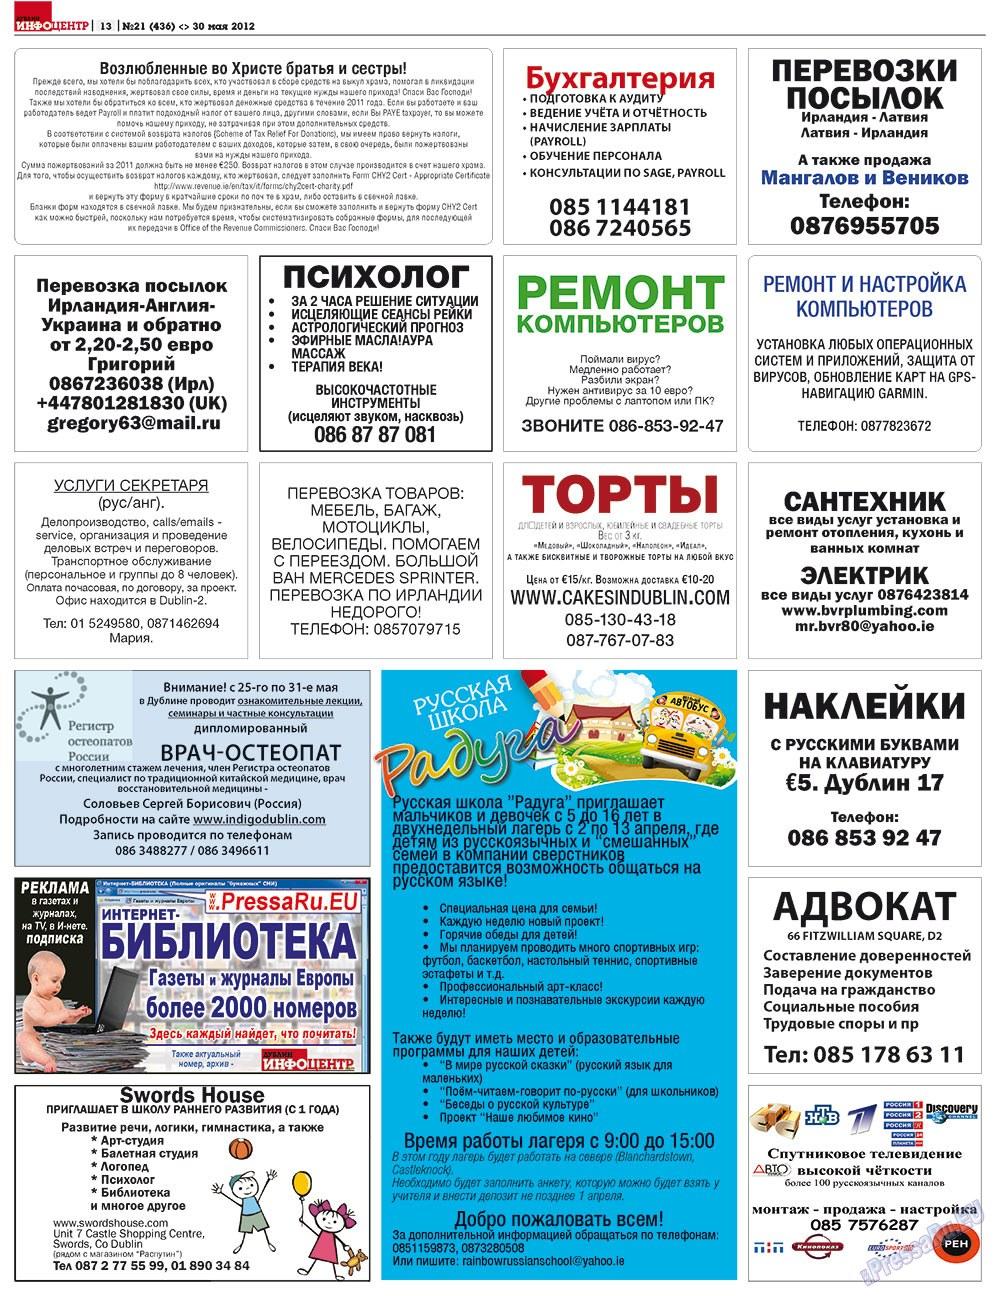 Дублин инфоцентр (газета). 2012 год, номер 21, стр. 13